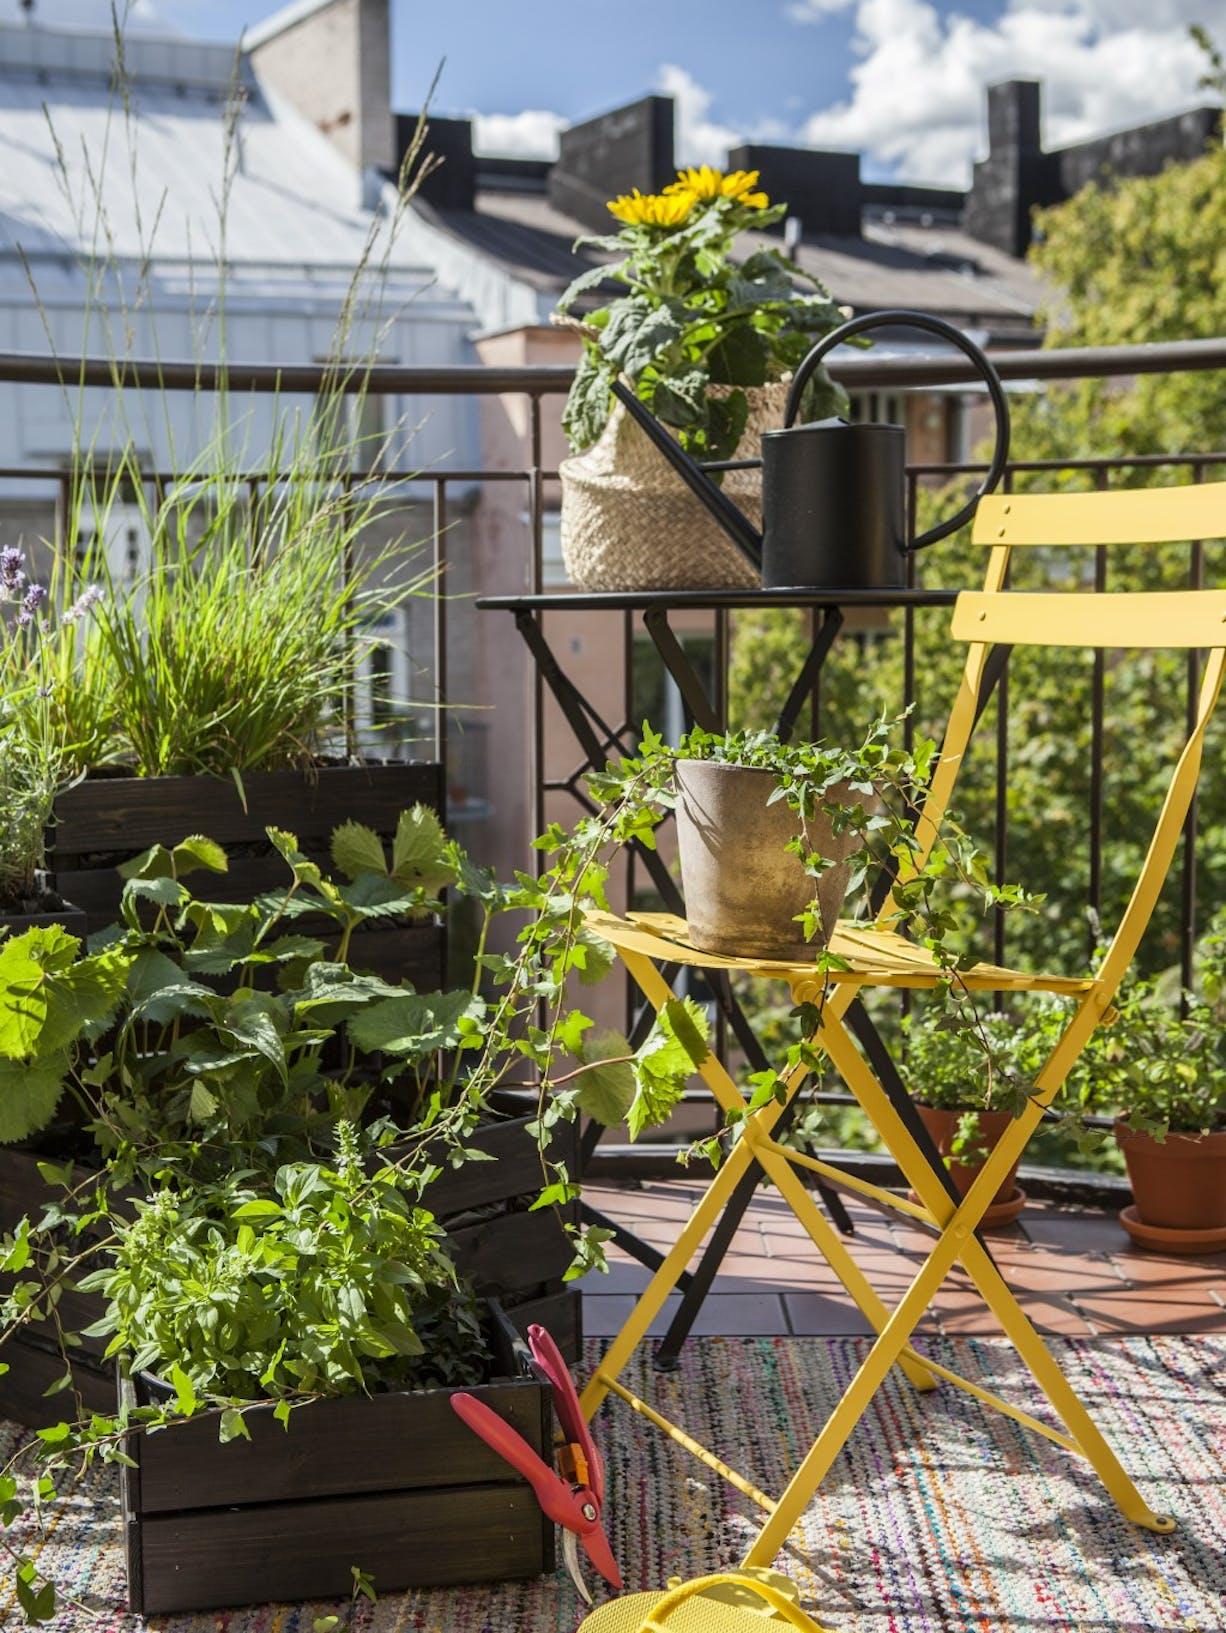 Turn Your Balcony Into An Outdoor Oasis | Chair Shot 1 | Tikkurila